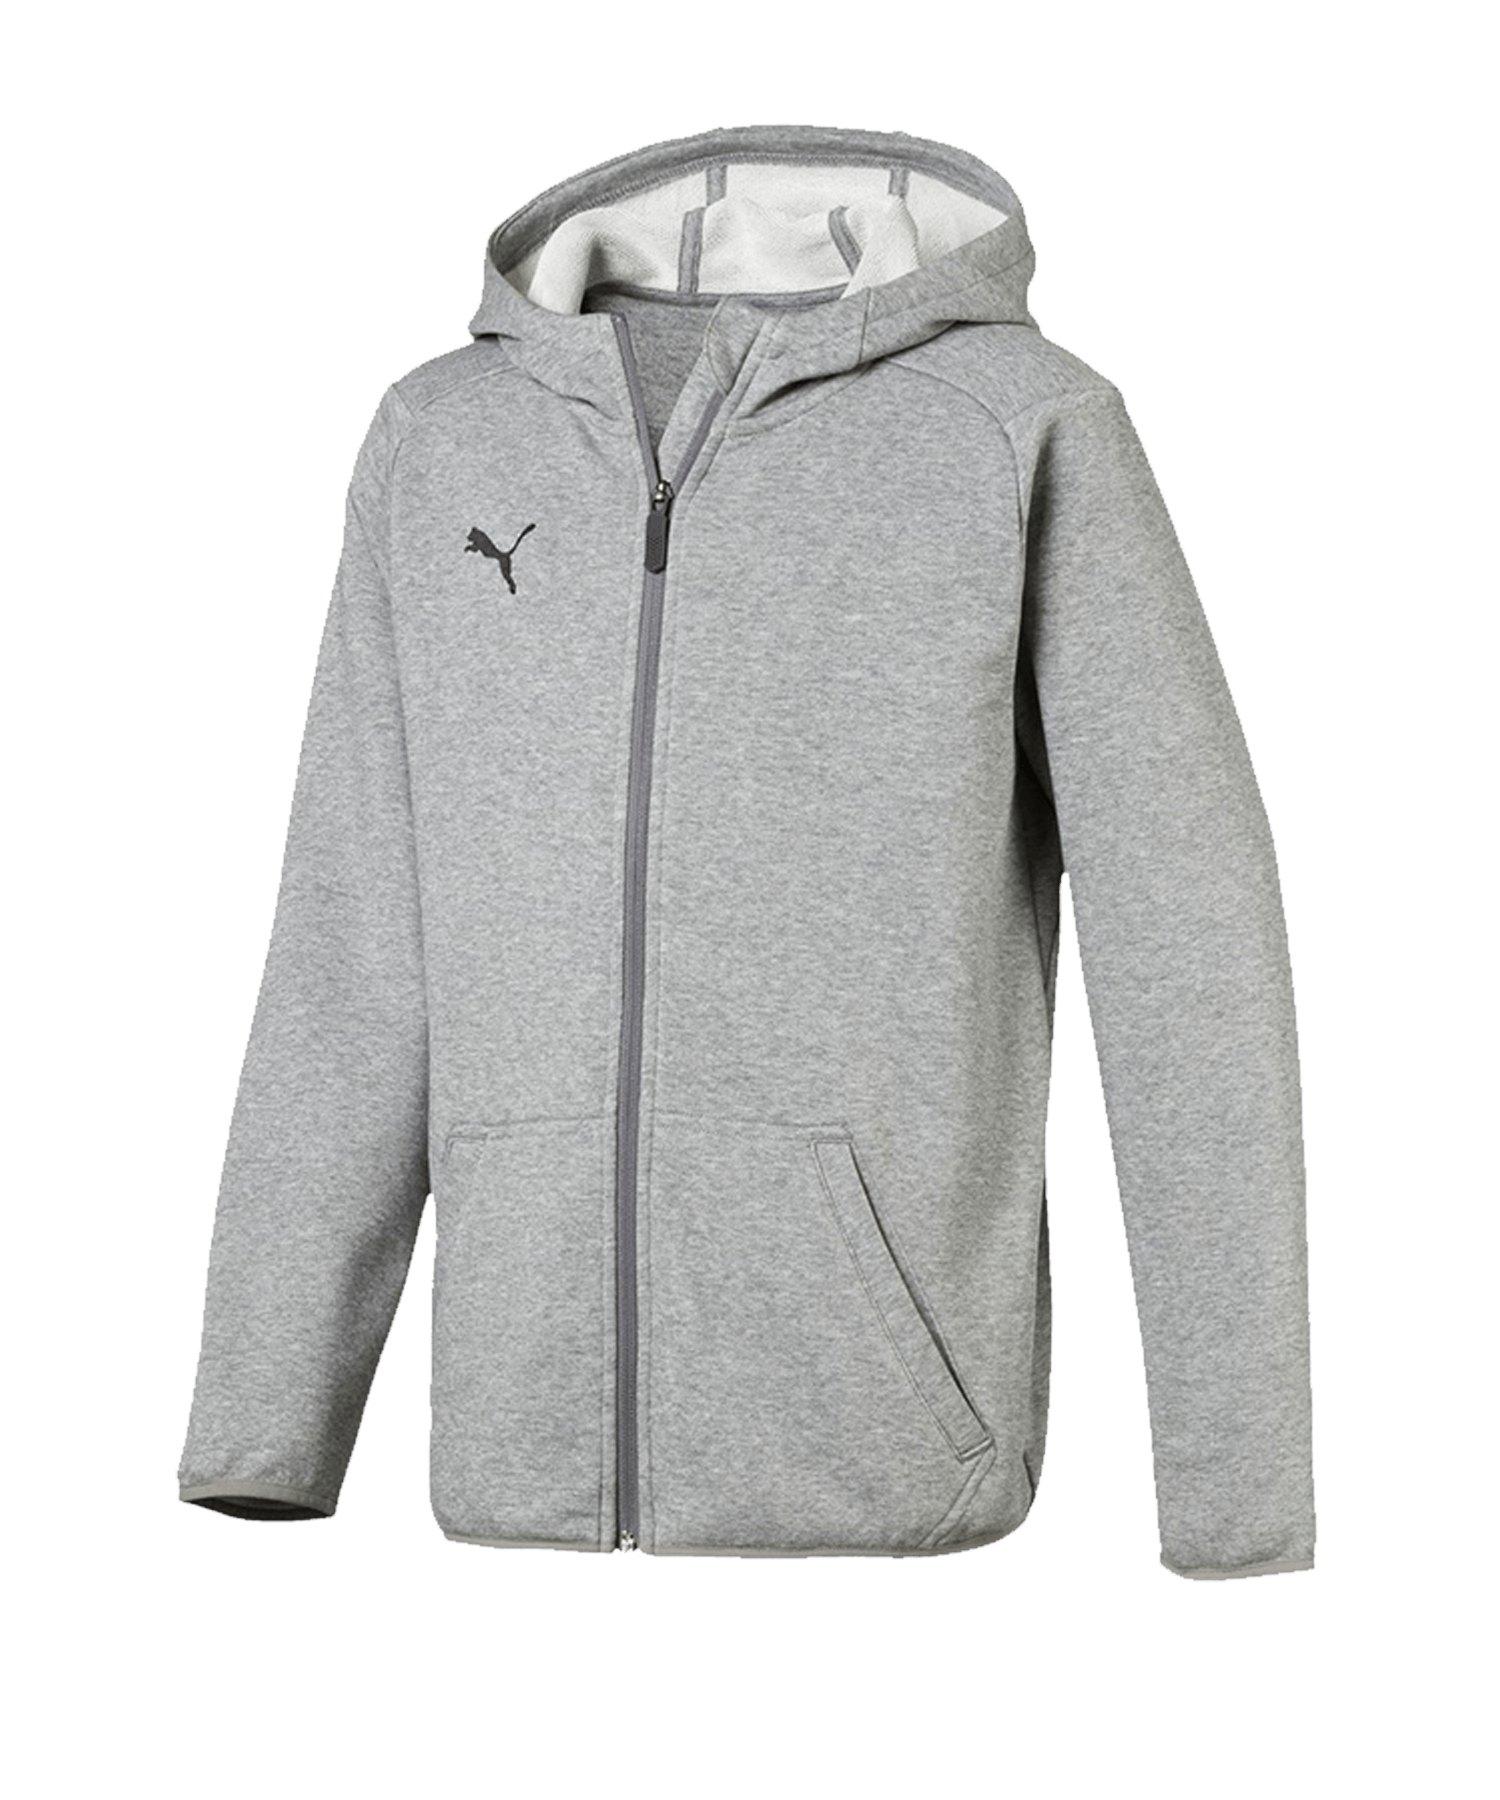 PUMA LIGA Casual Jacket Jacke Kids Grau F33 - grau